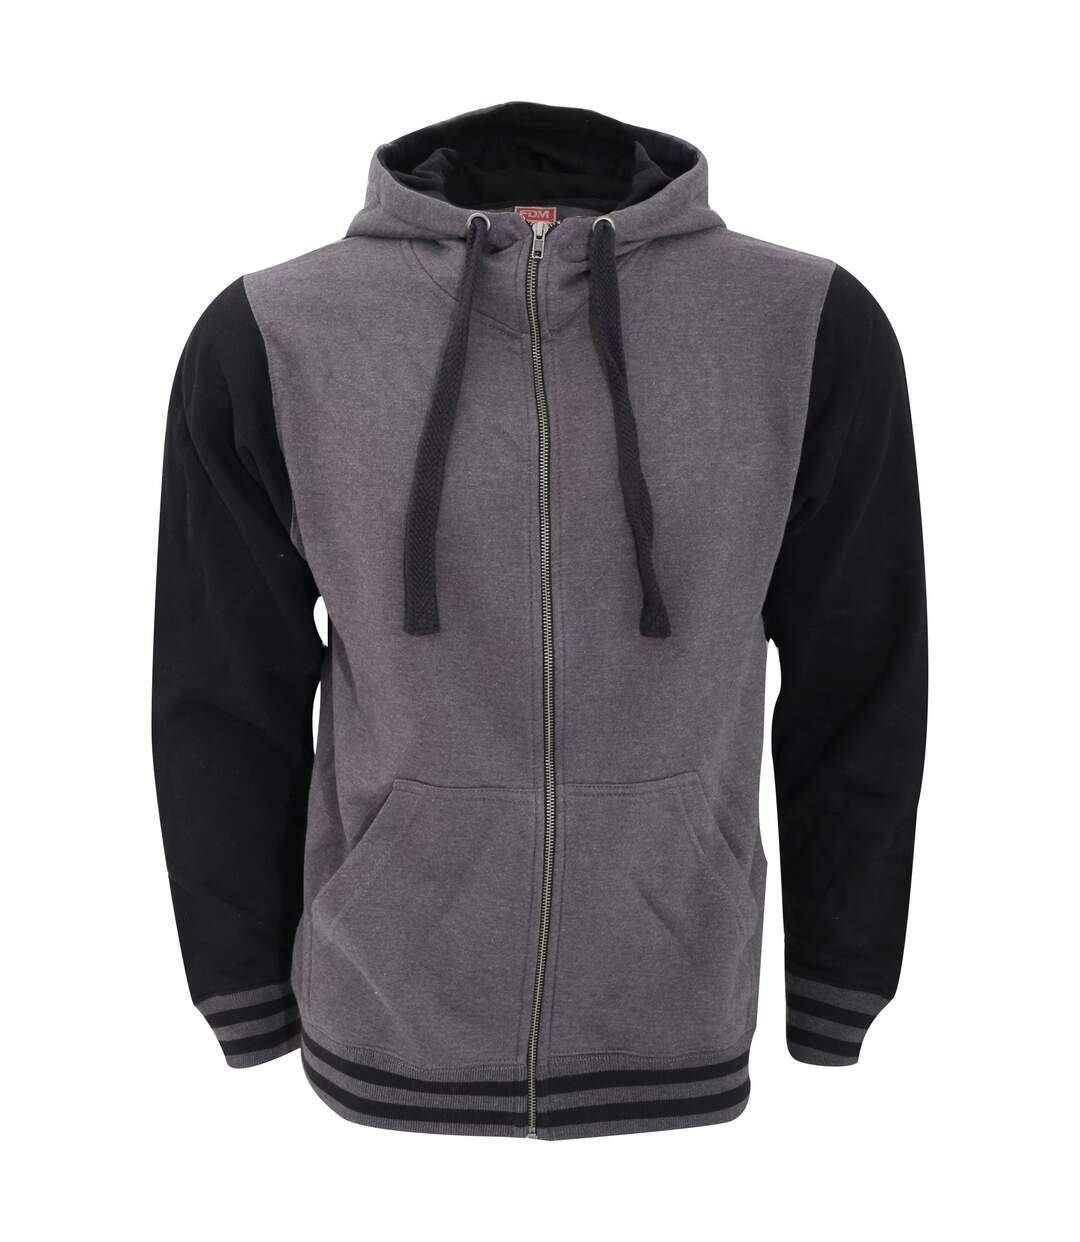 FDM Mens Active Zip Hoodie (Charcoal/Black) - UTBC3183